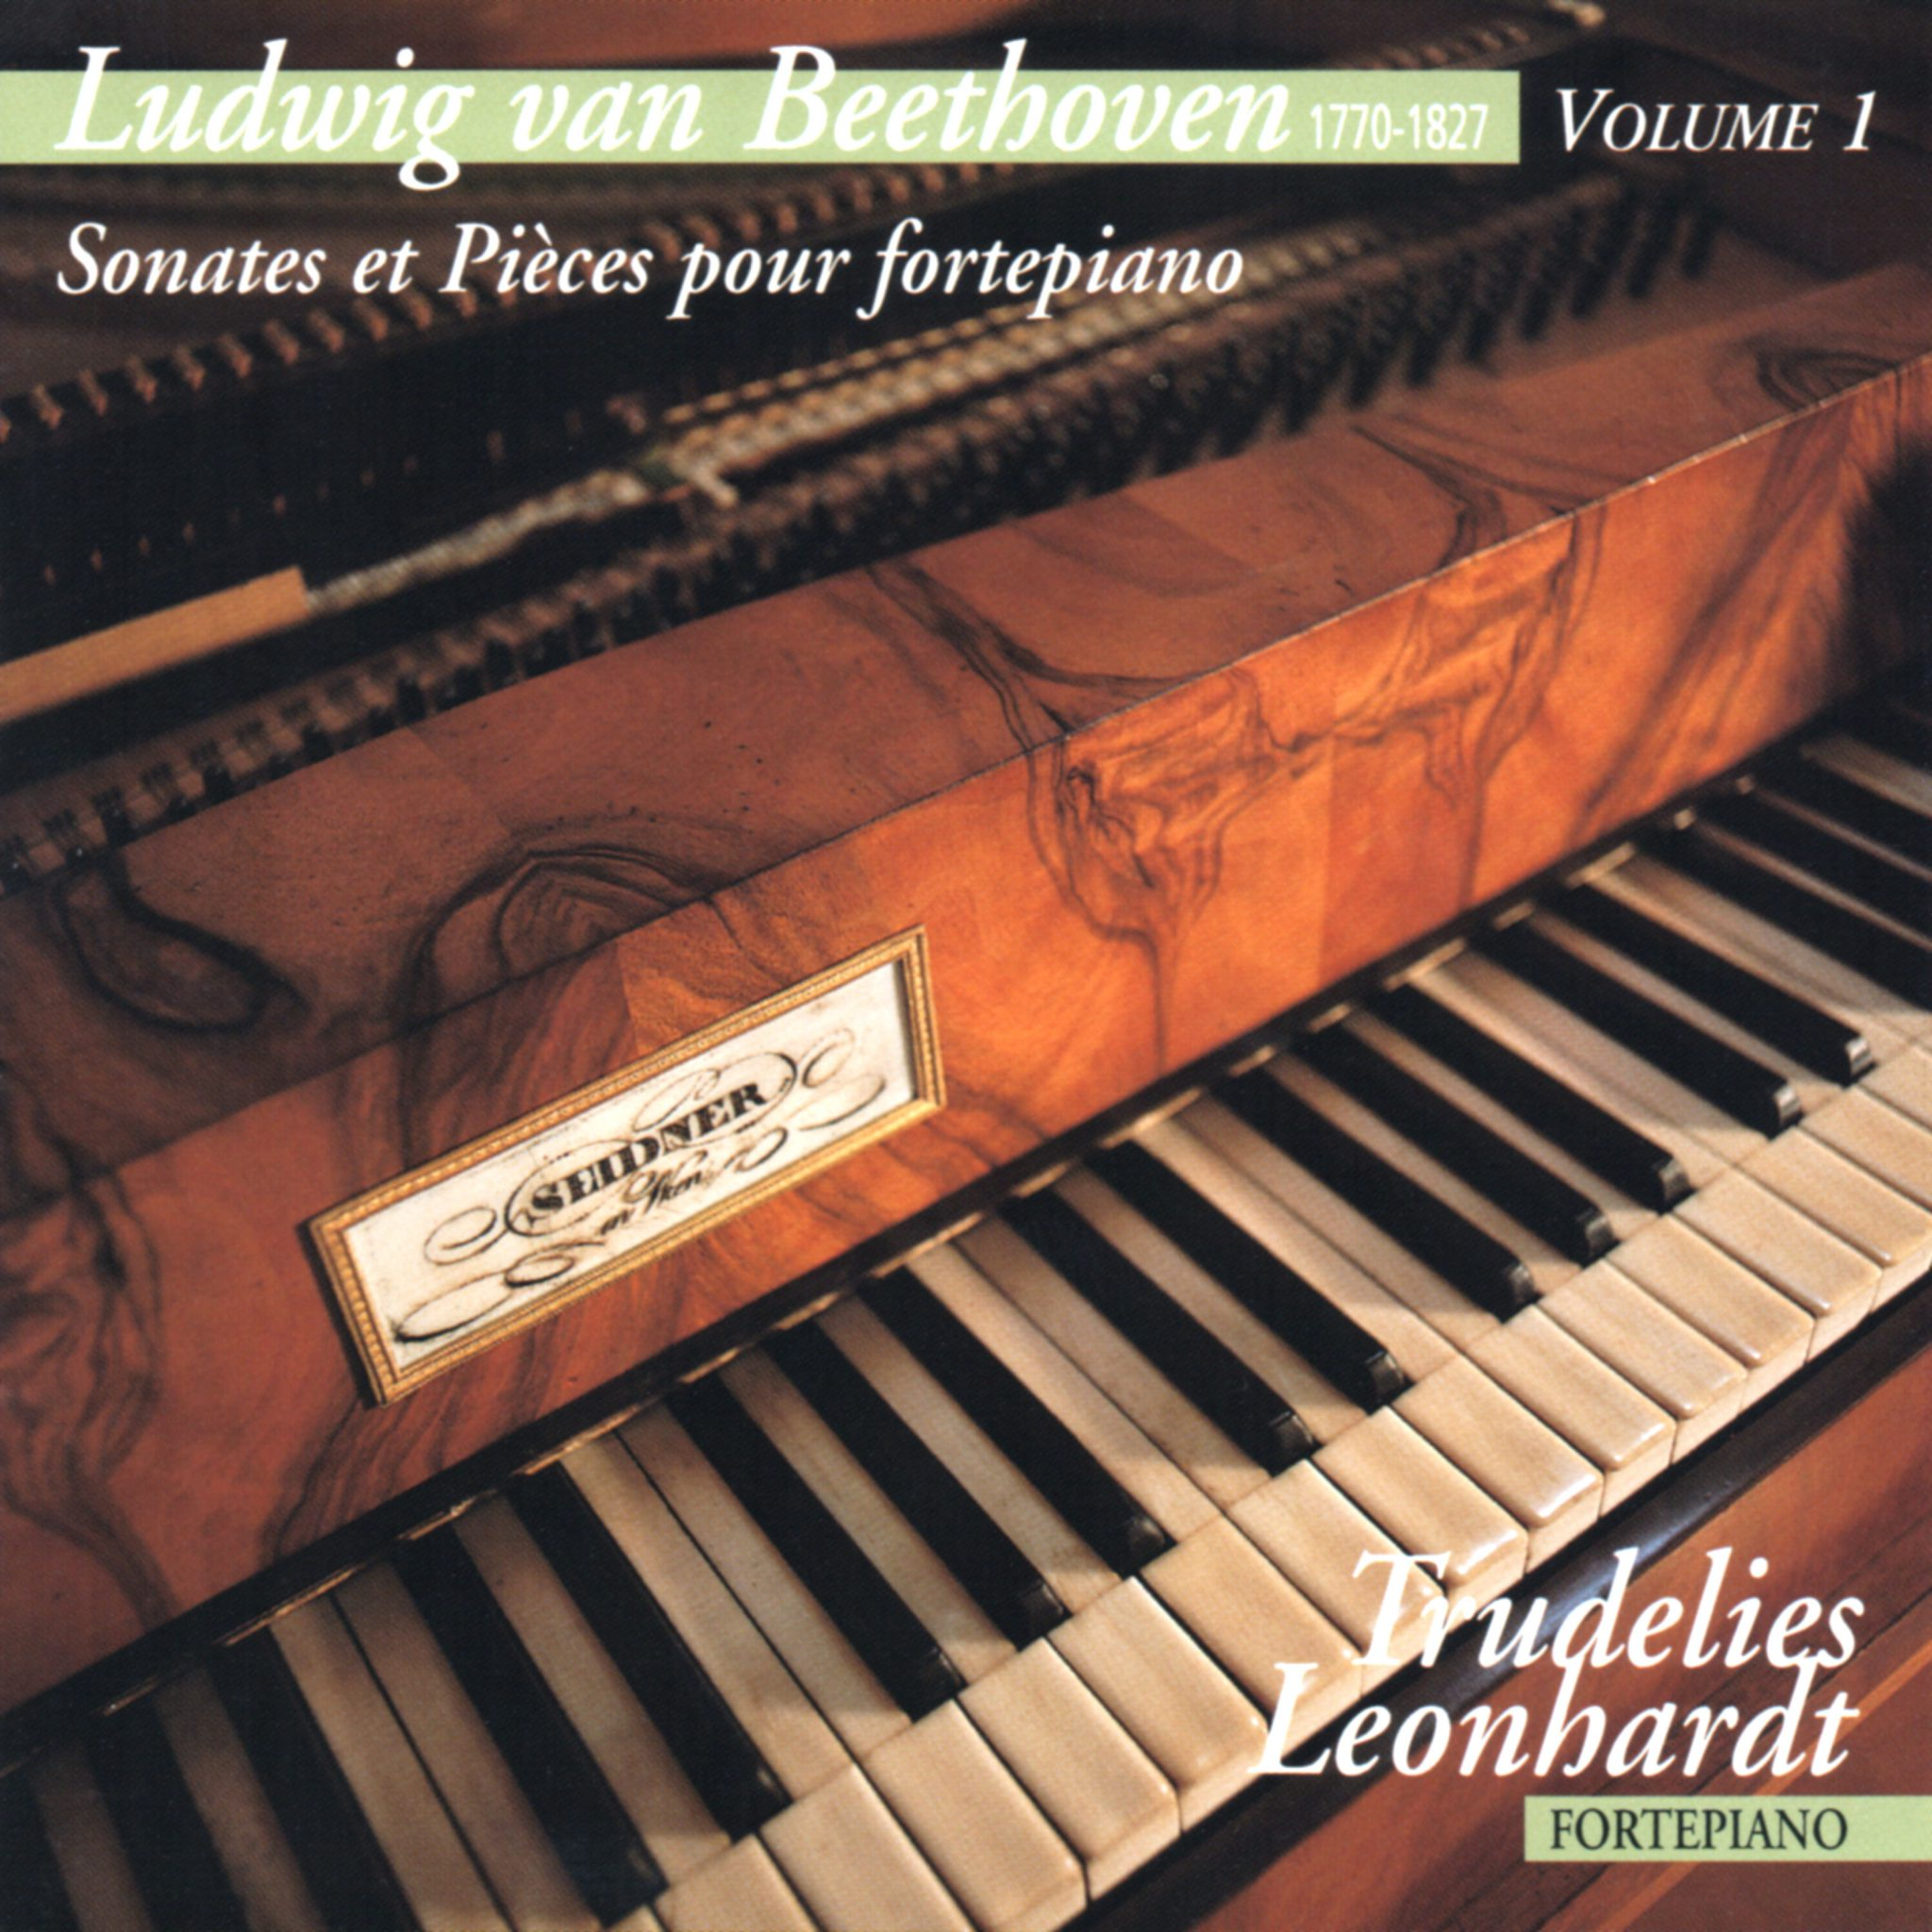 Ludwig van Beethoven - Für Elise - Piano Sonata WoO 47 - Trudelies Leonhardt - Fortepiano